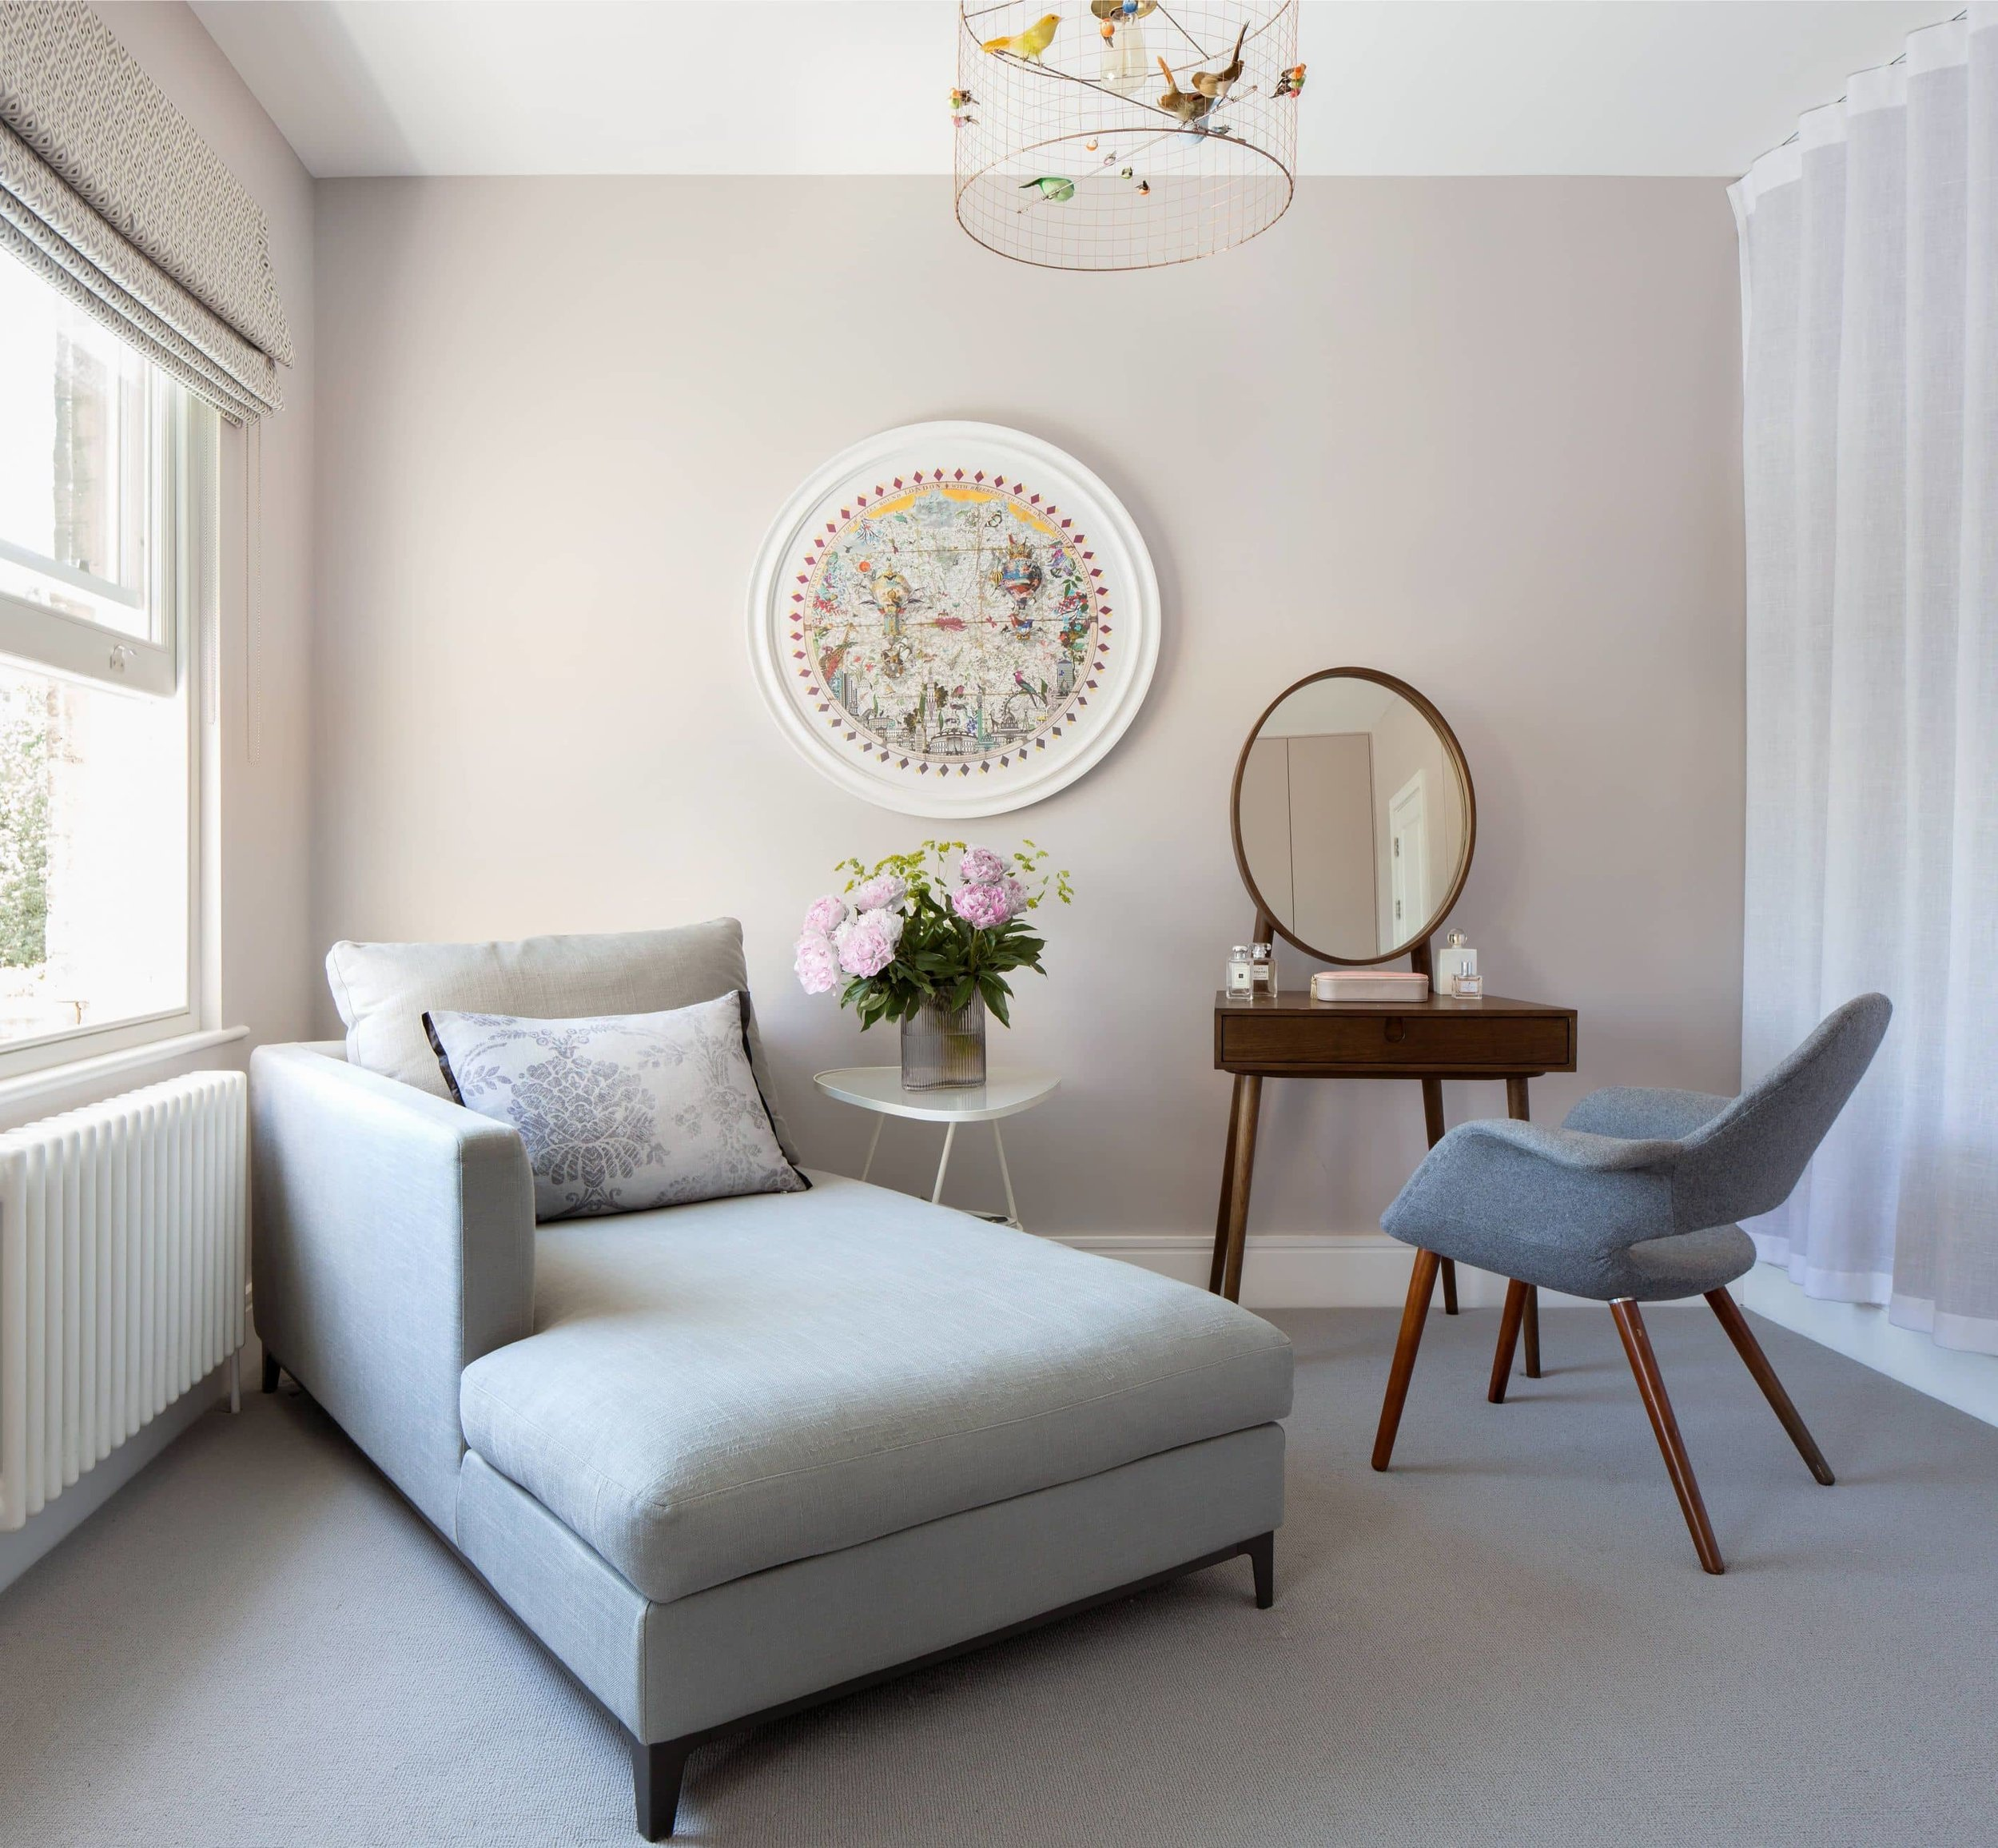 Fulham-Master-Bedroom-Suite-Refurbishment-London-6.jpg